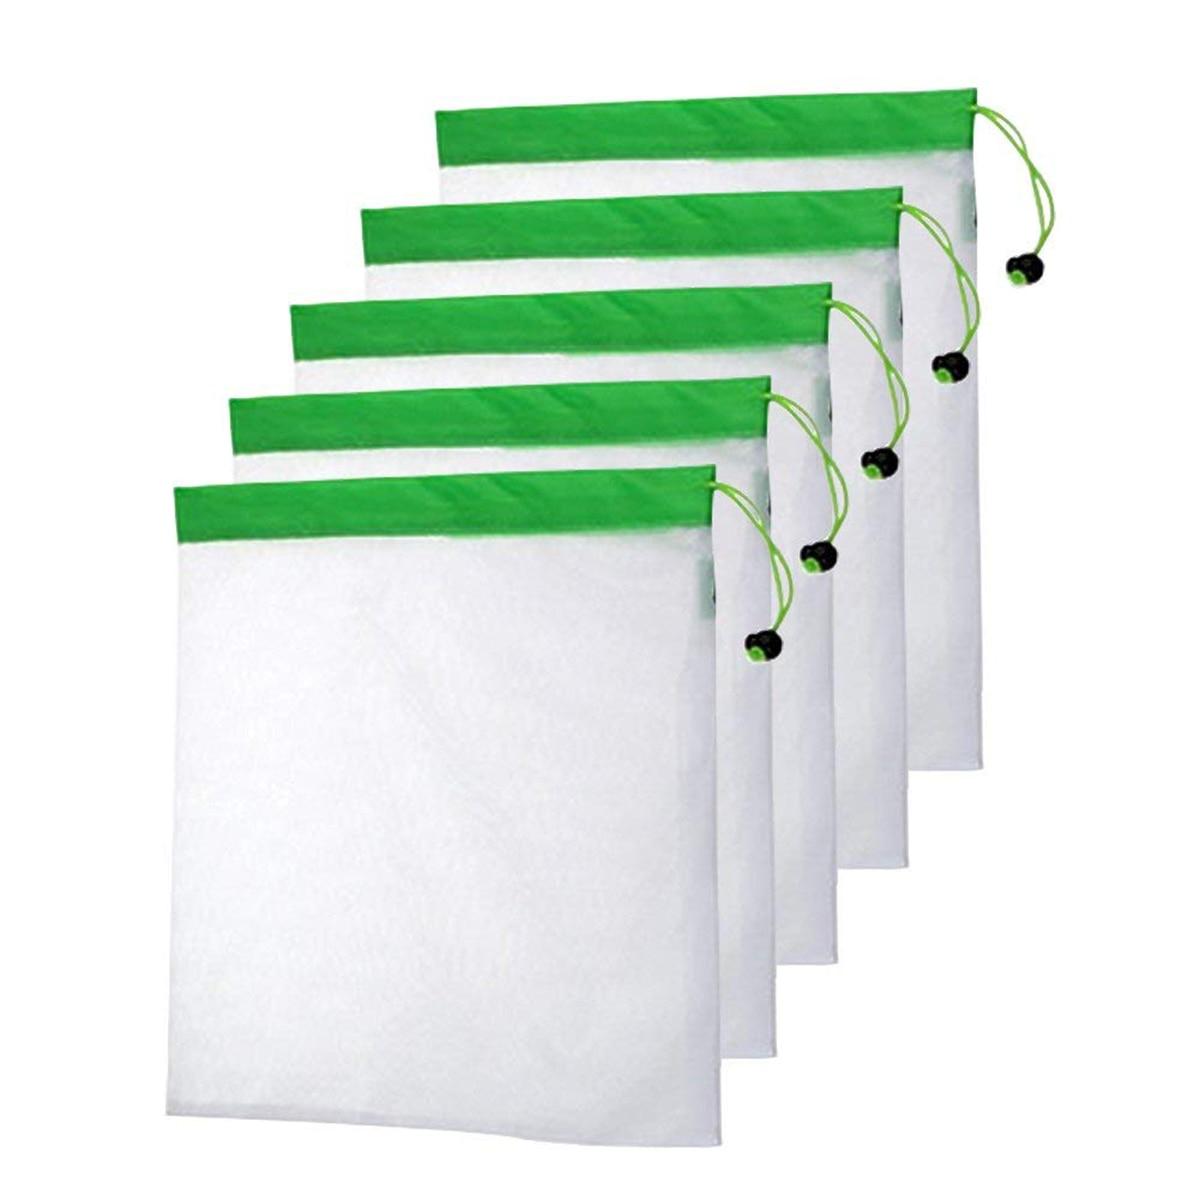 DCOS 5PCS/Set Polyester Washable Reusable Produce Bags, Eco-friendly Soft Premium Lightweight Vegetable Drawstring Storage Net